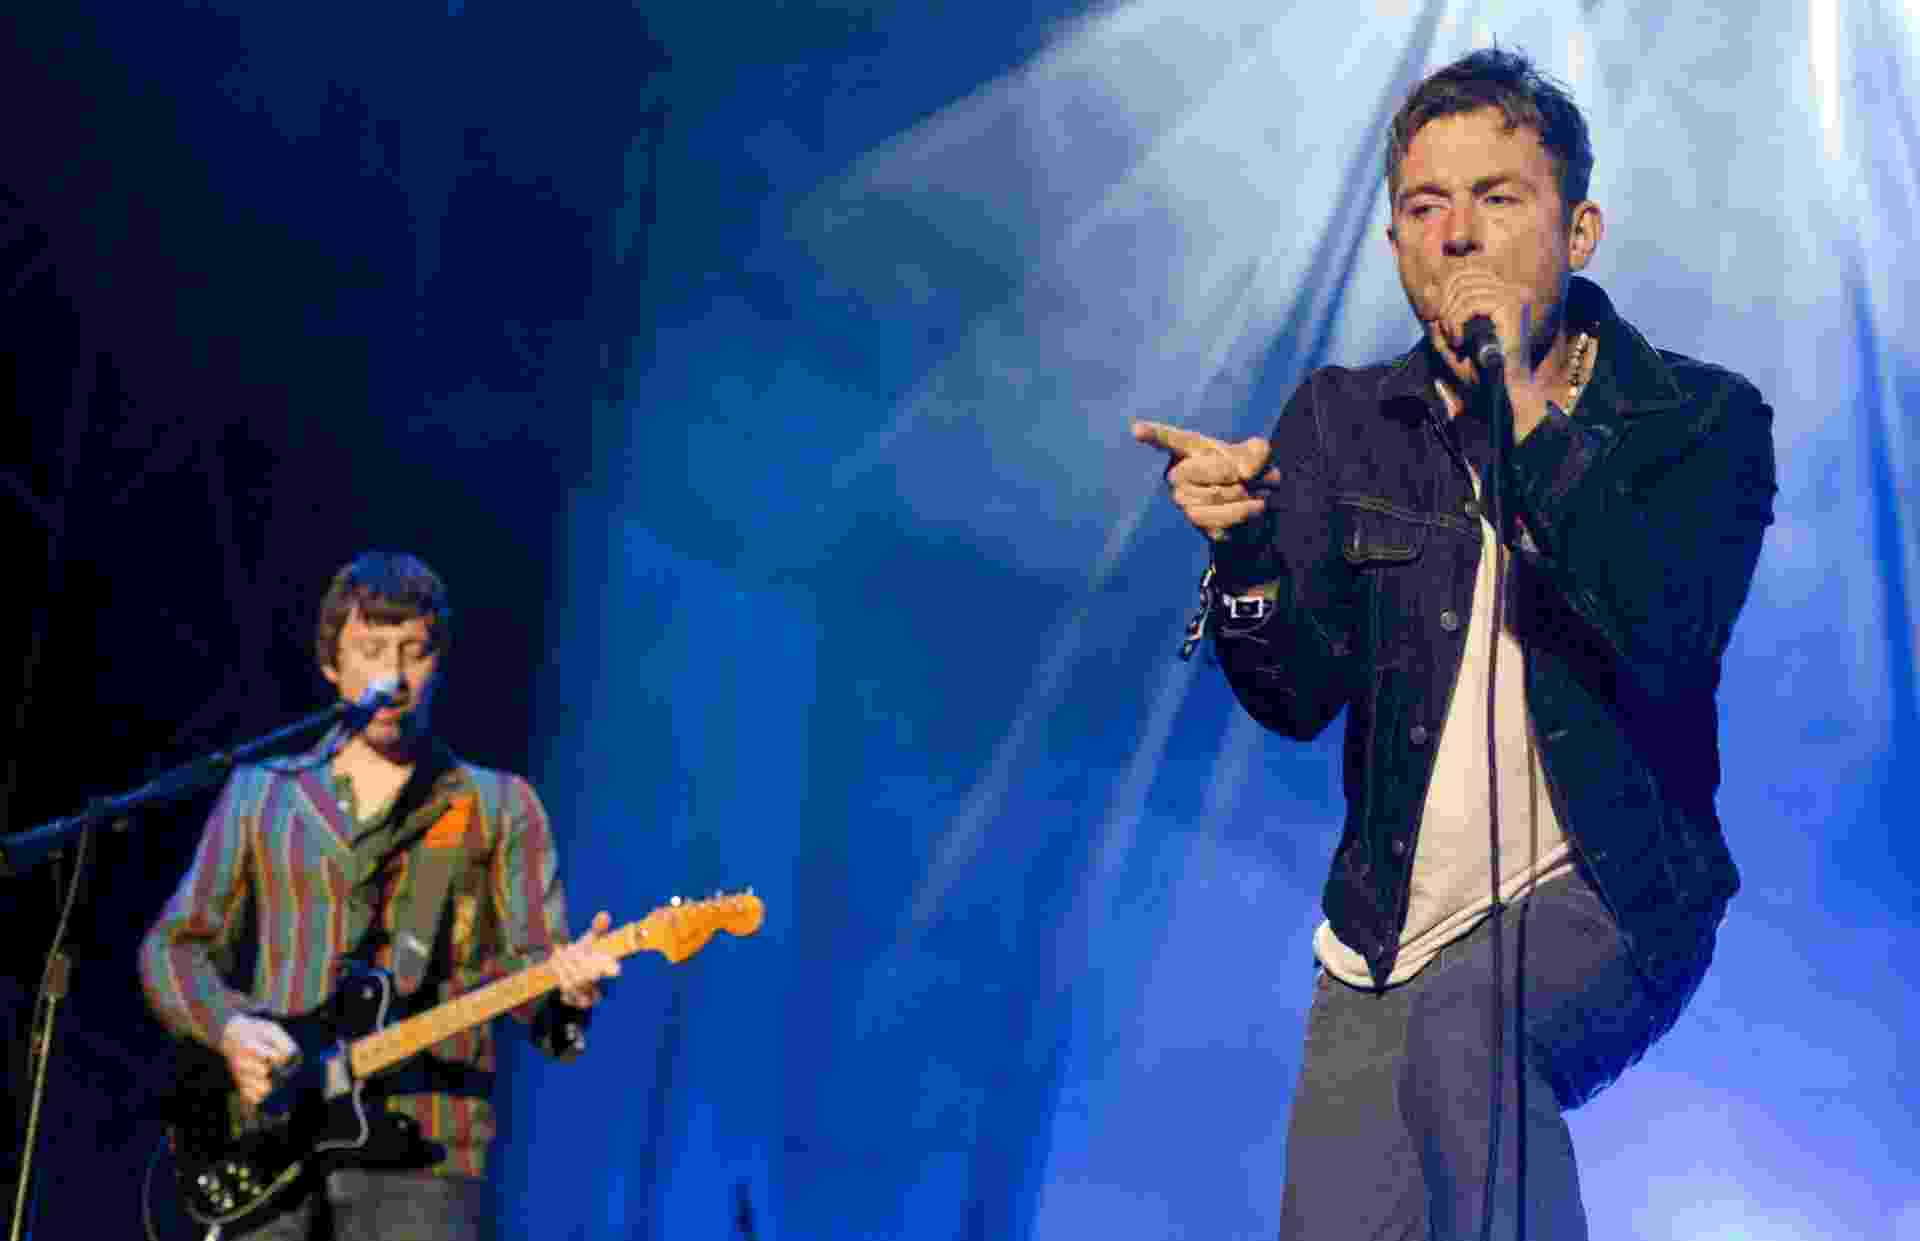 25.mai.2013 - A banda Blur se apresenta no Primavera Sound, em Barcelona - Alejandro García/EFE